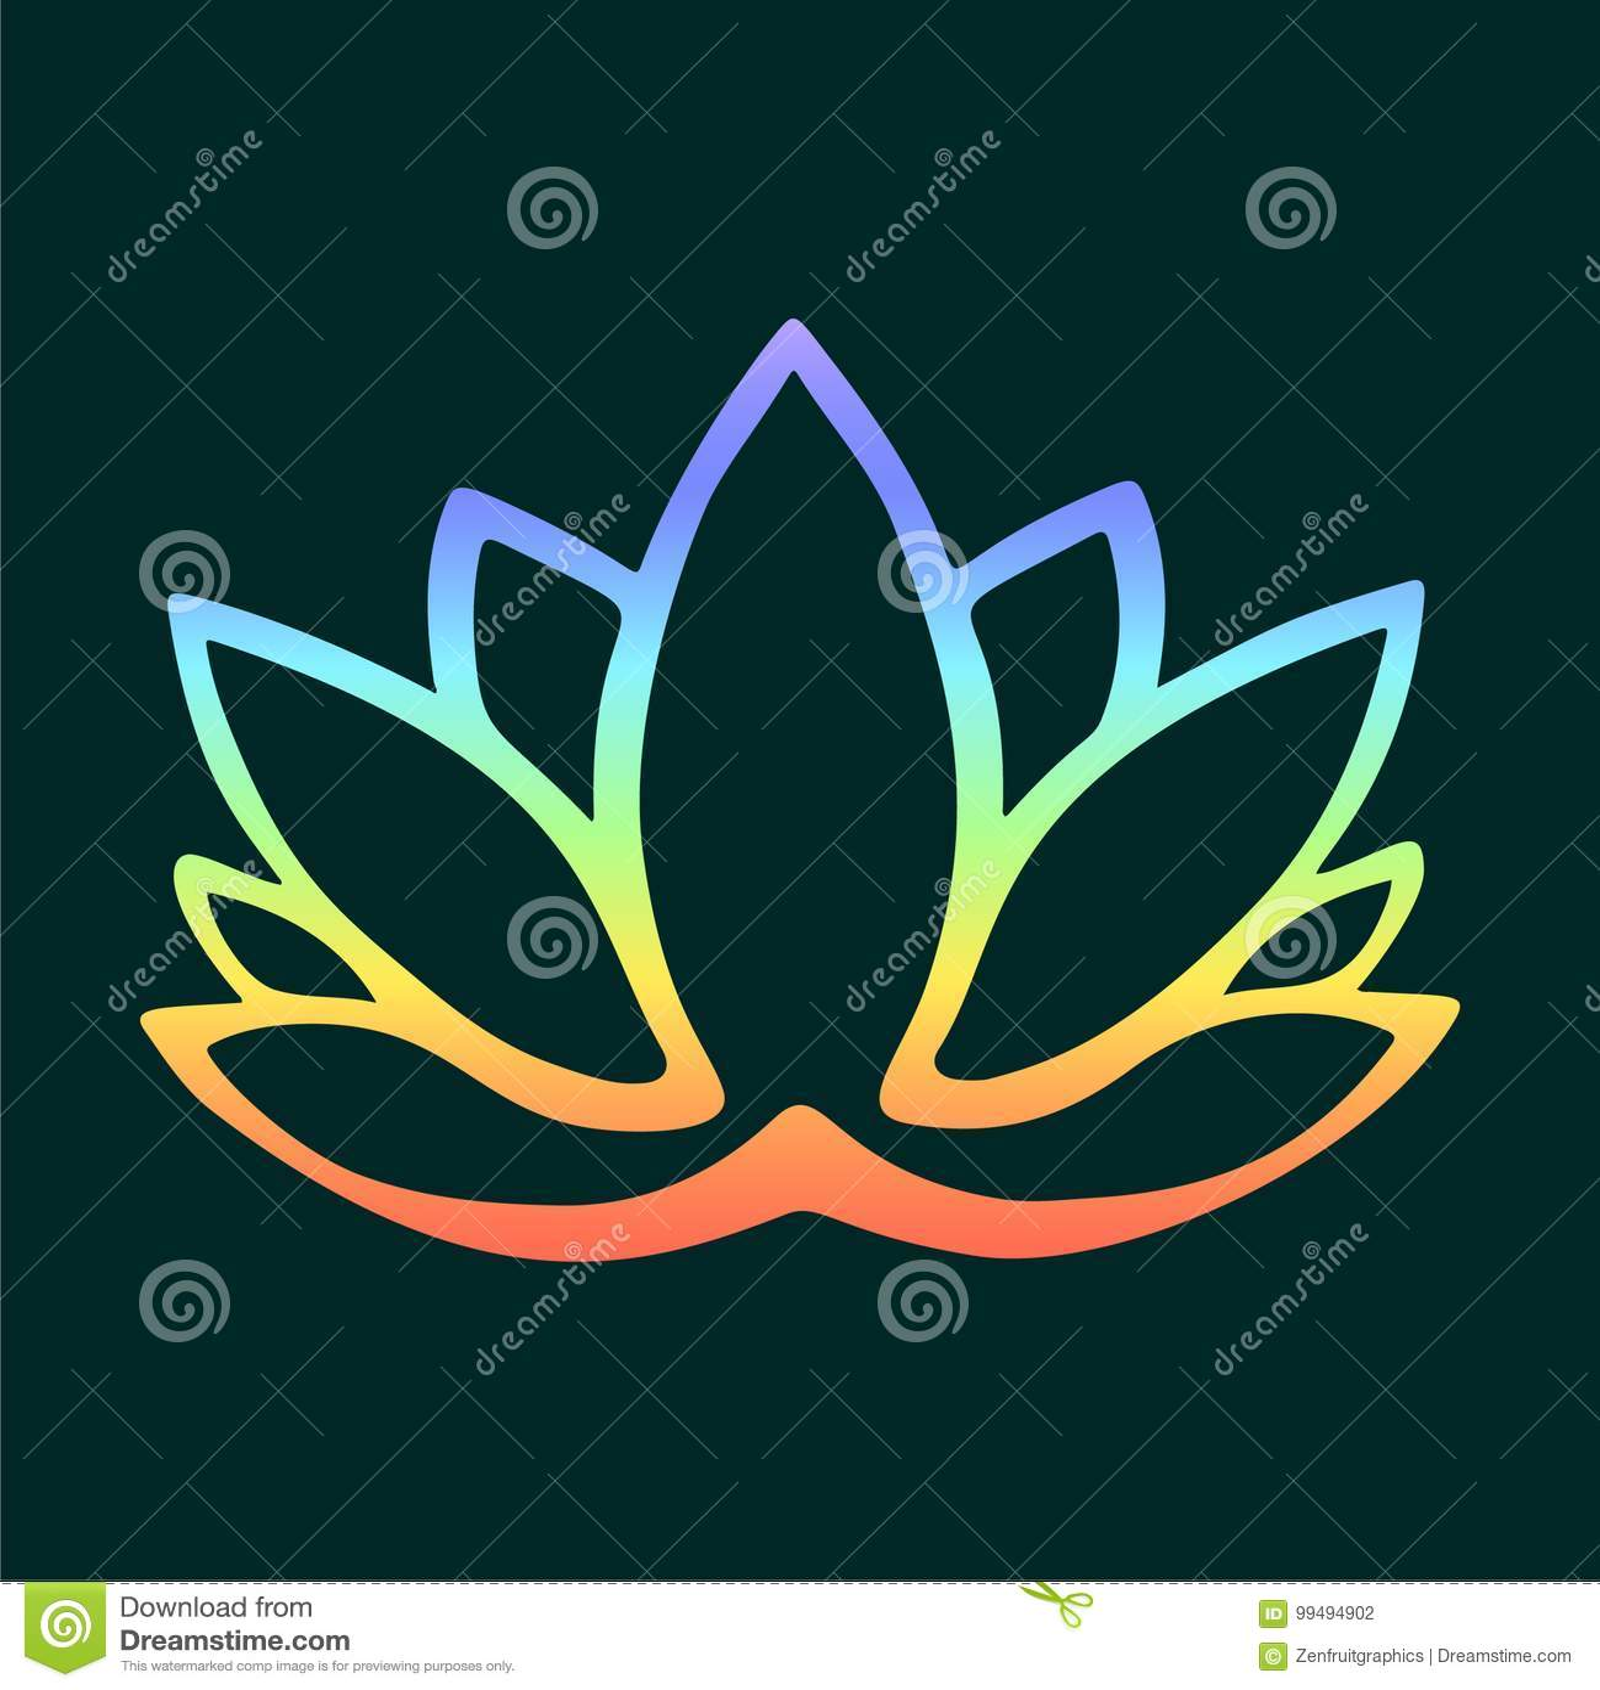 Stylized Lotus Flower Logo On Dark Background Hand Drawn Fantasy